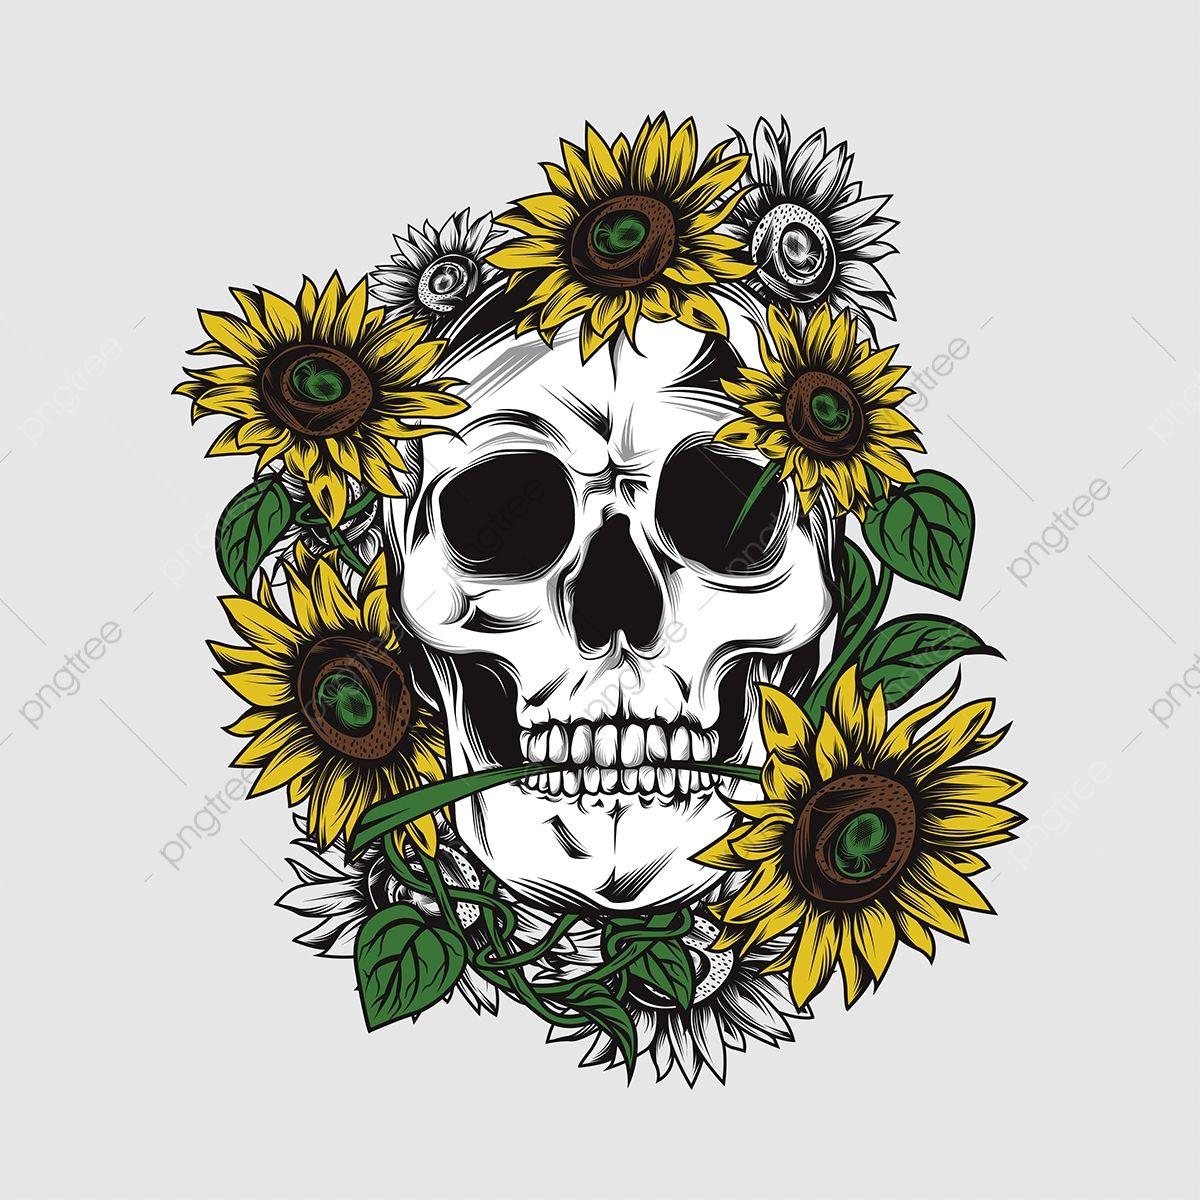 Skull With Sunflower Vector Skull Clipart Skull Icons Sunflower Icons Png And Vector With Transparent Background For Free Download Sunflower Art Print Sunflower Art Skull Icon